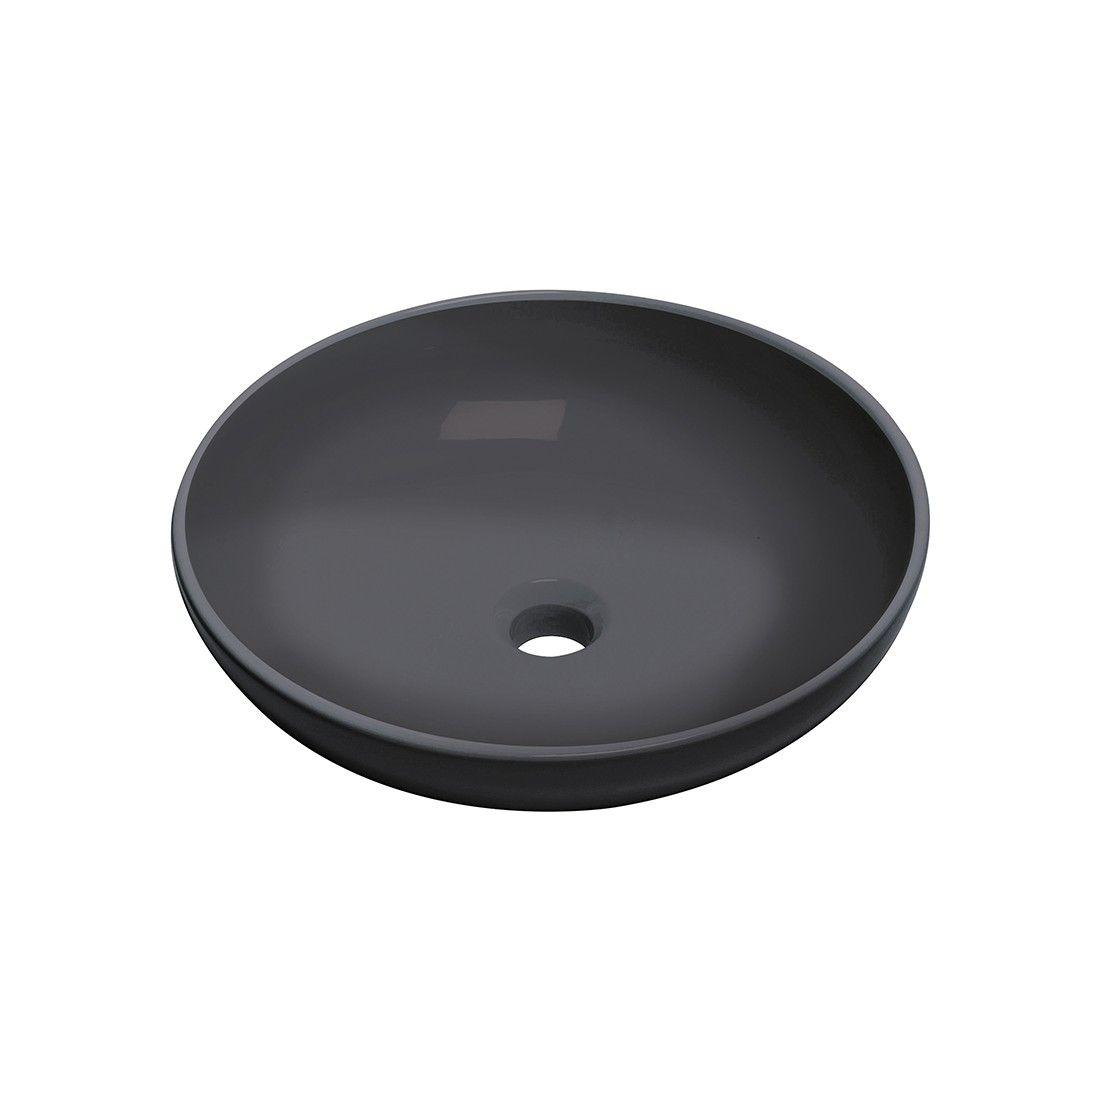 Profil de la même vasque Tondo en blanc